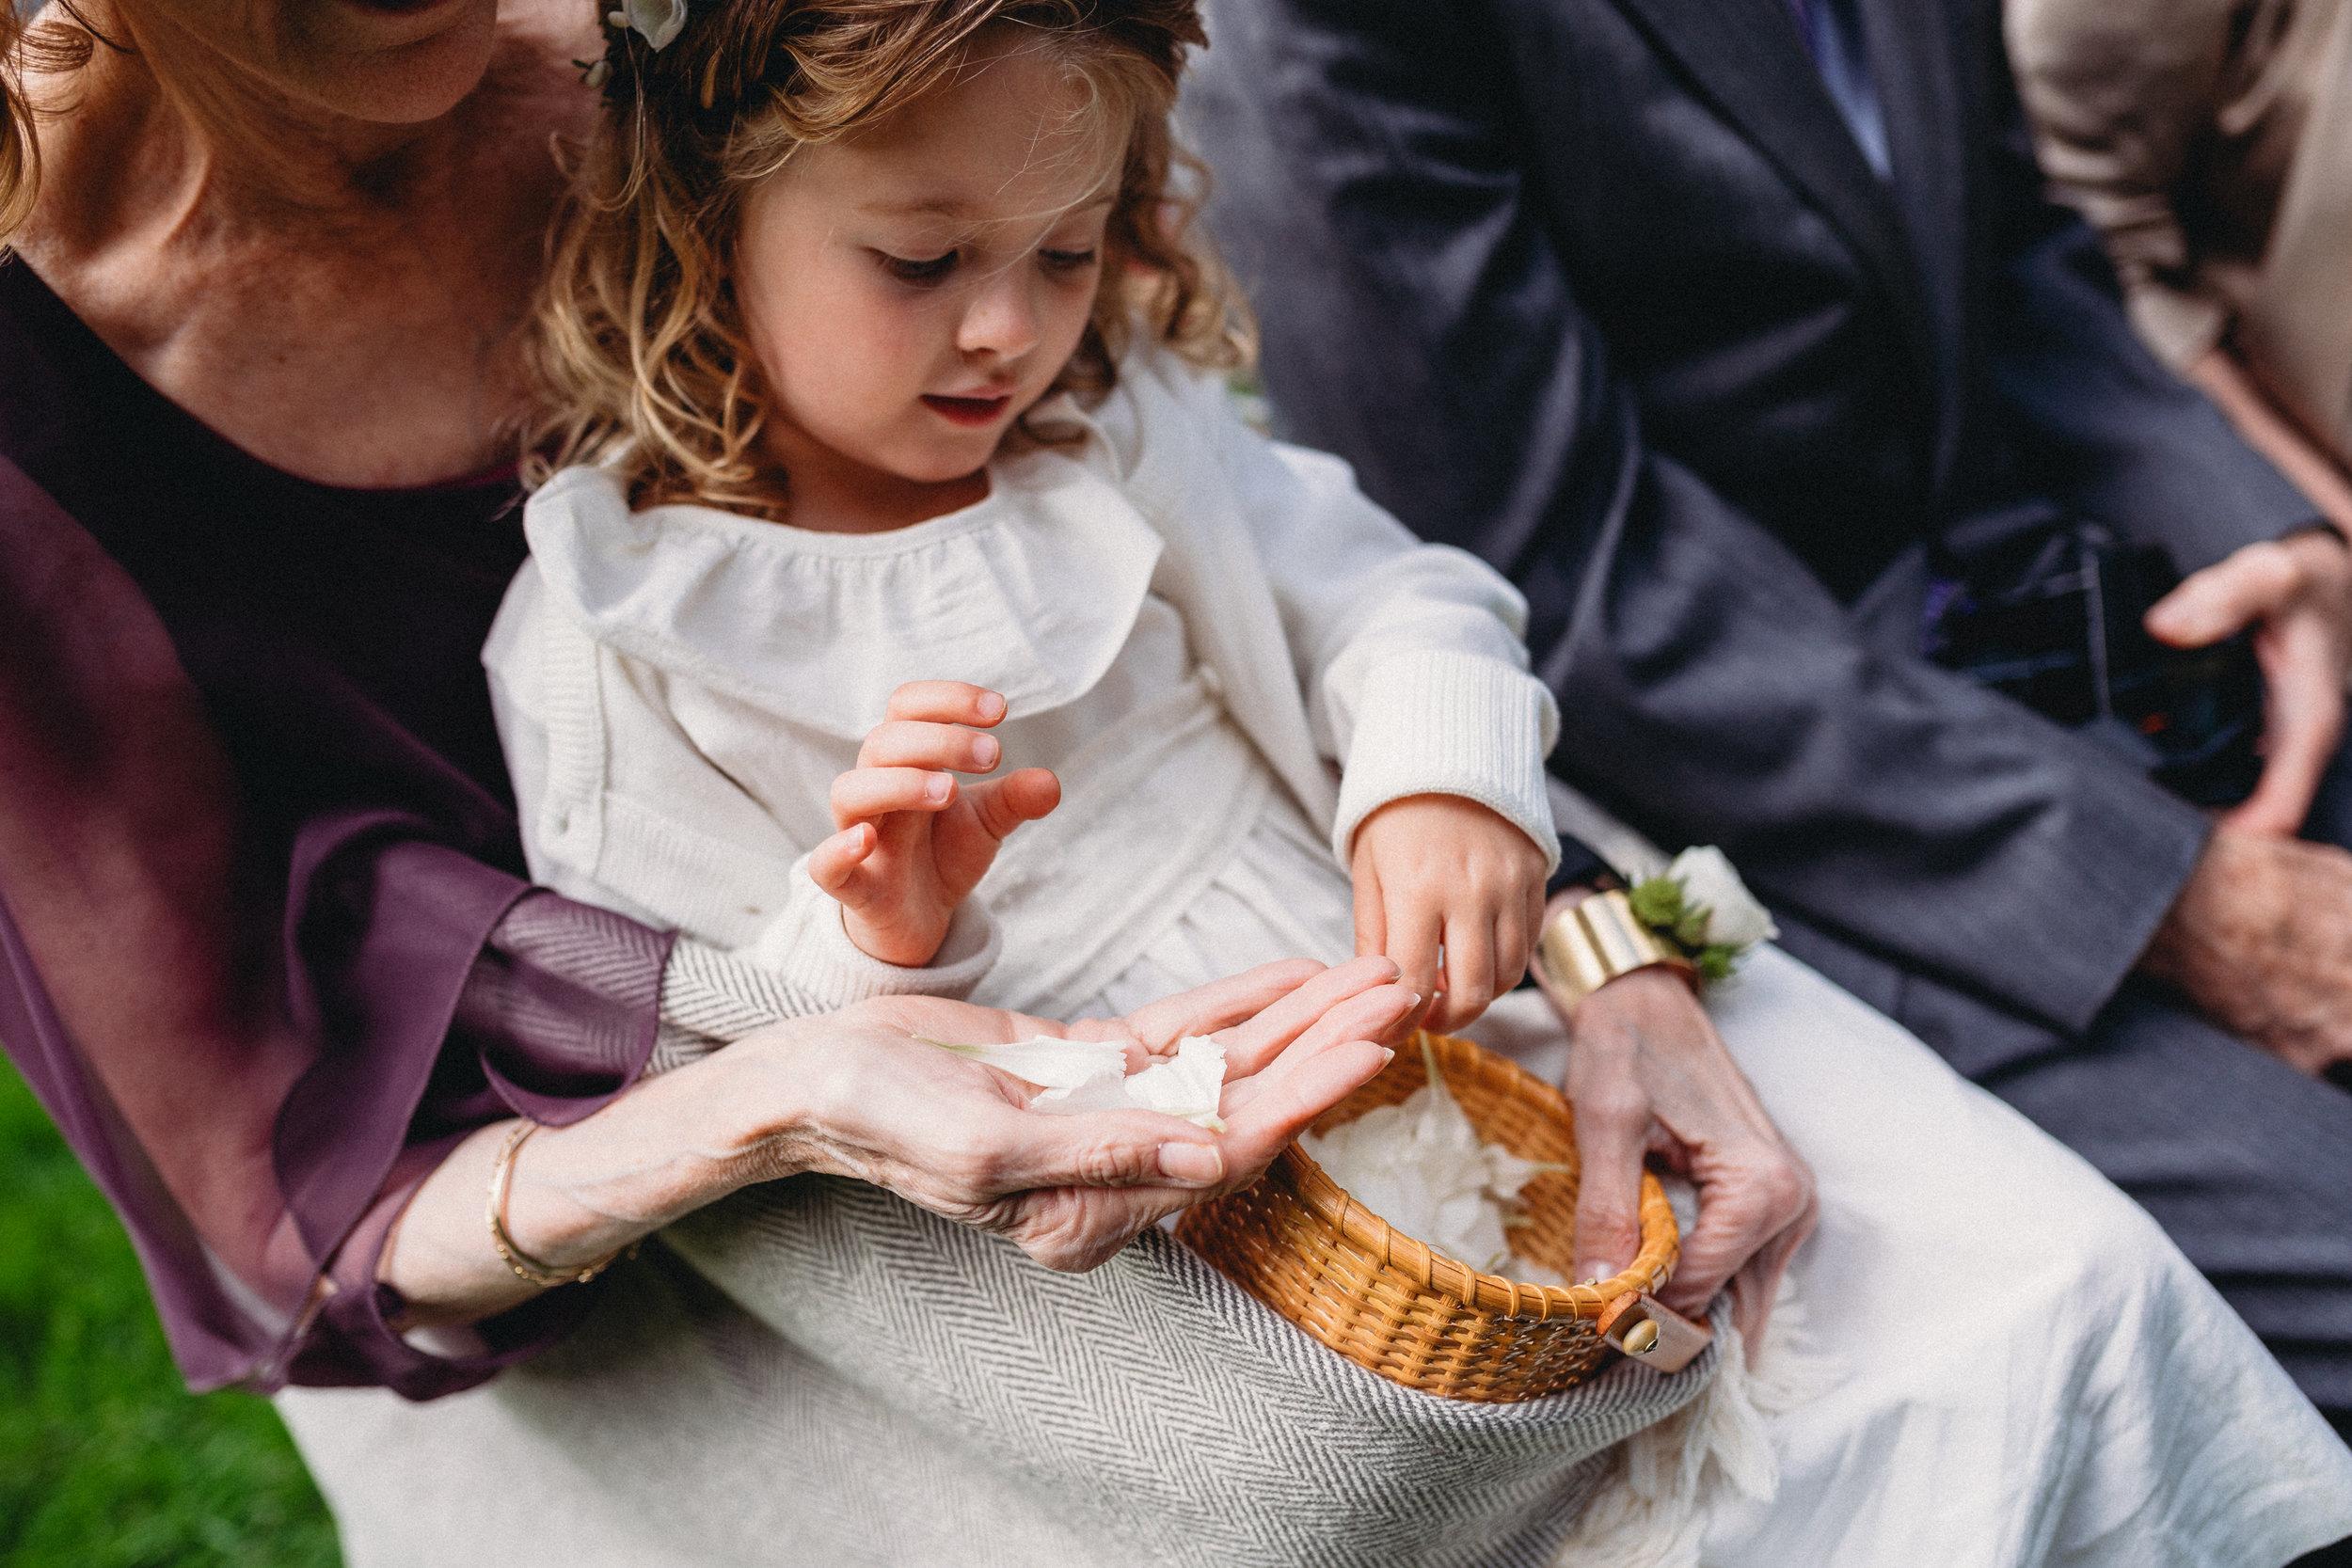 wedding-photography-santa-barbara-courthouse-rebeccaylasotras-21.jpg